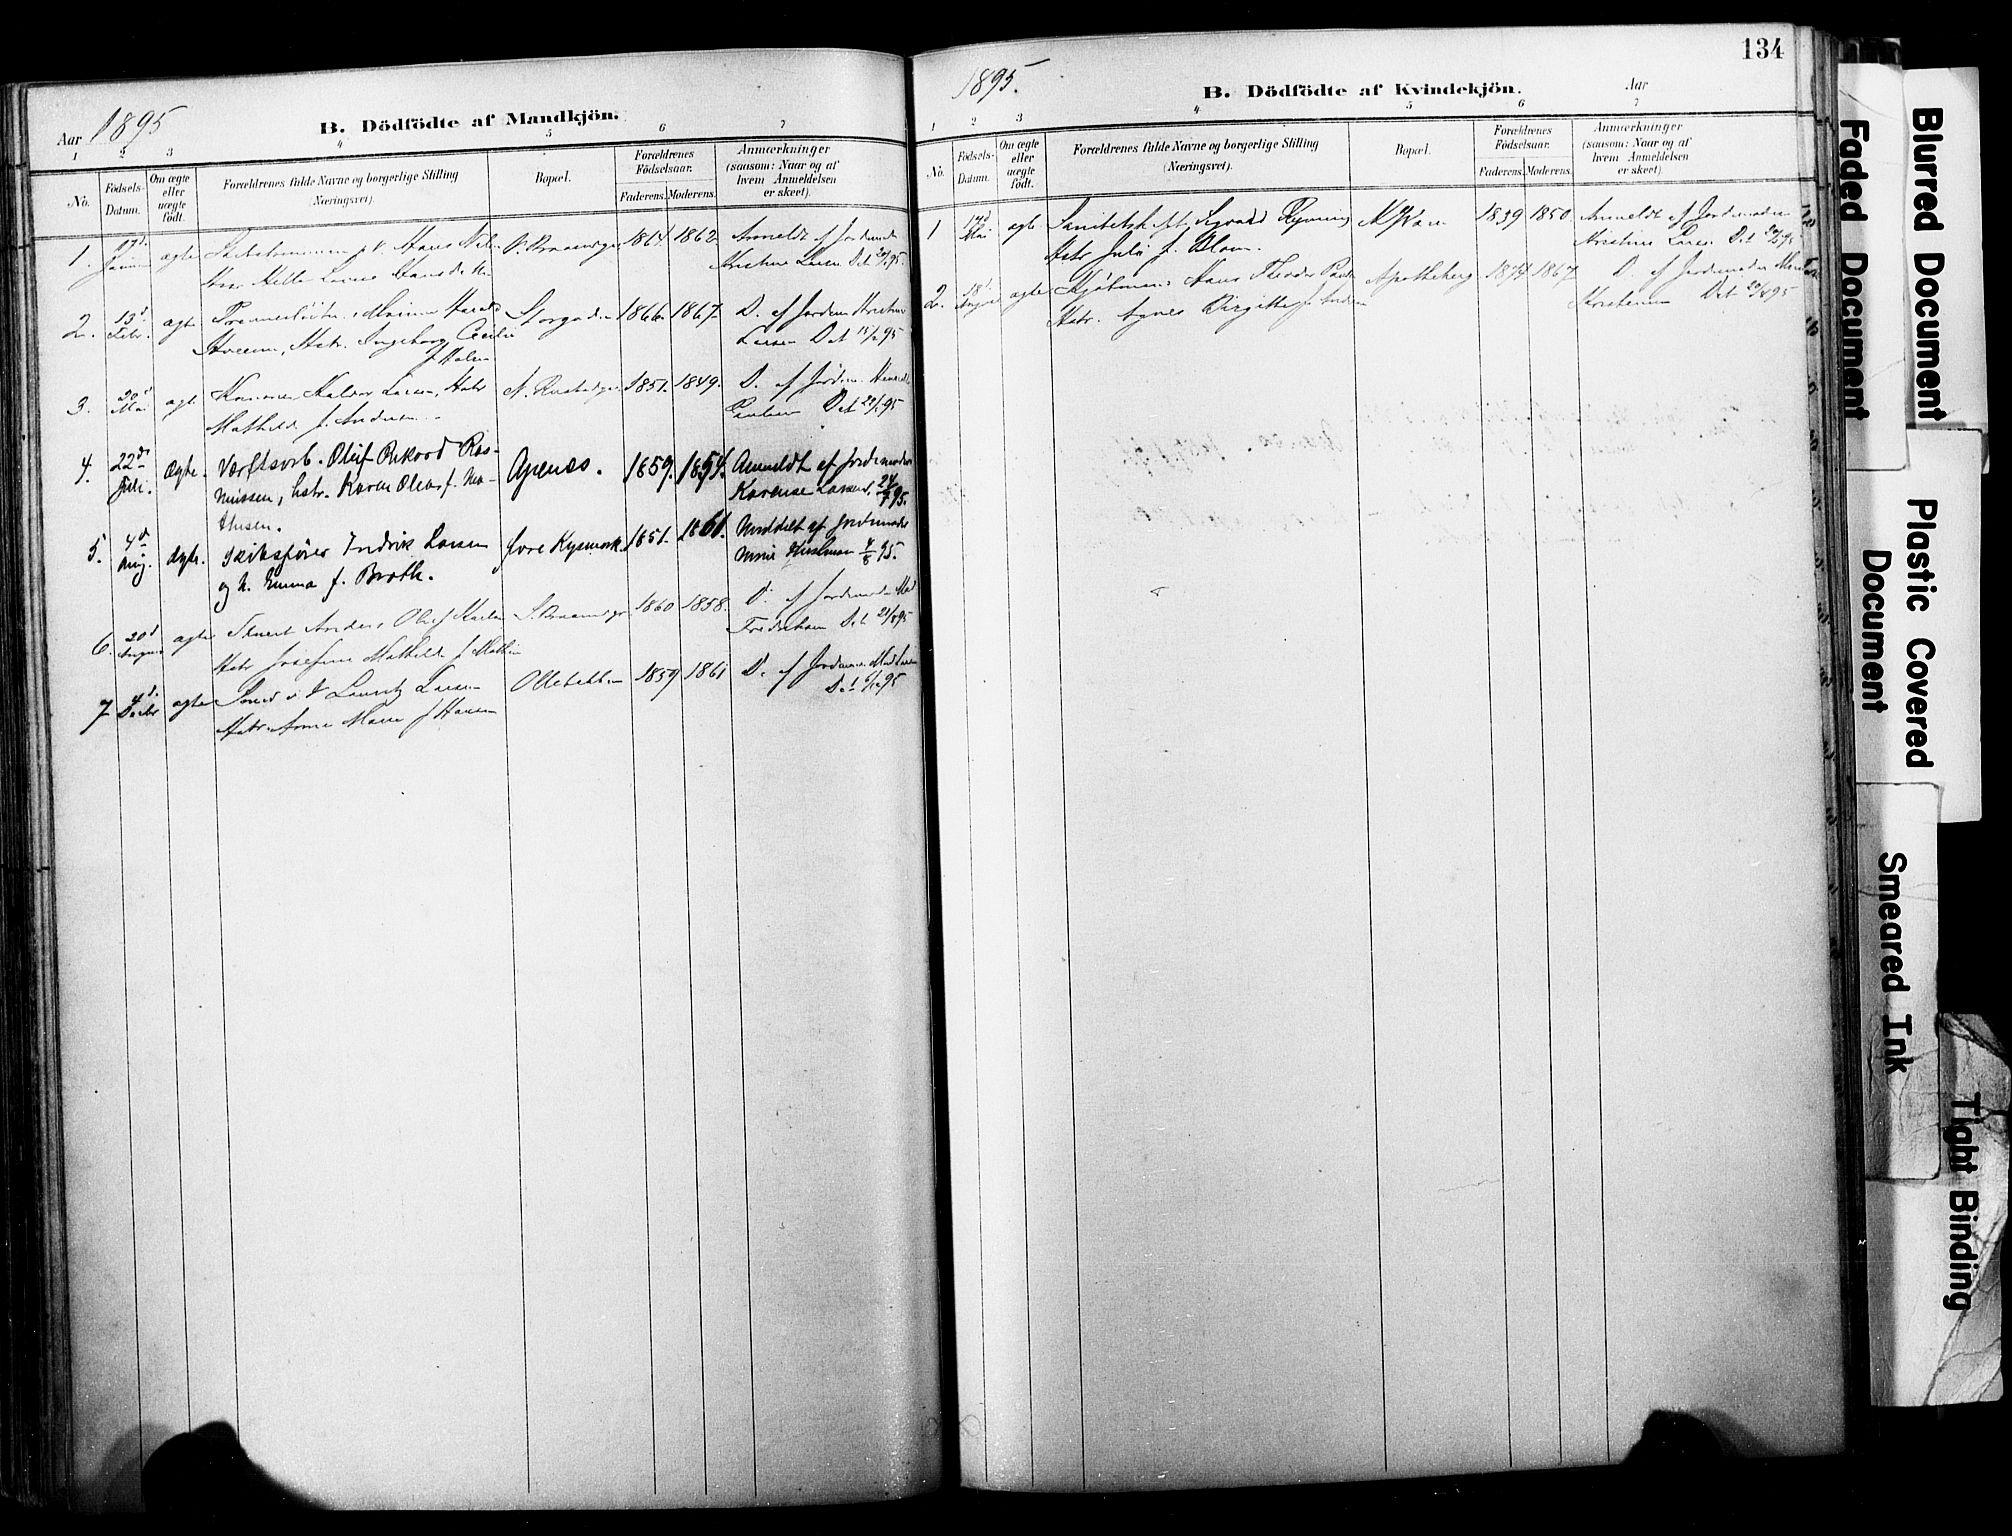 SAKO, Horten kirkebøker, F/Fa/L0004: Parish register (official) no. 4, 1888-1895, p. 134